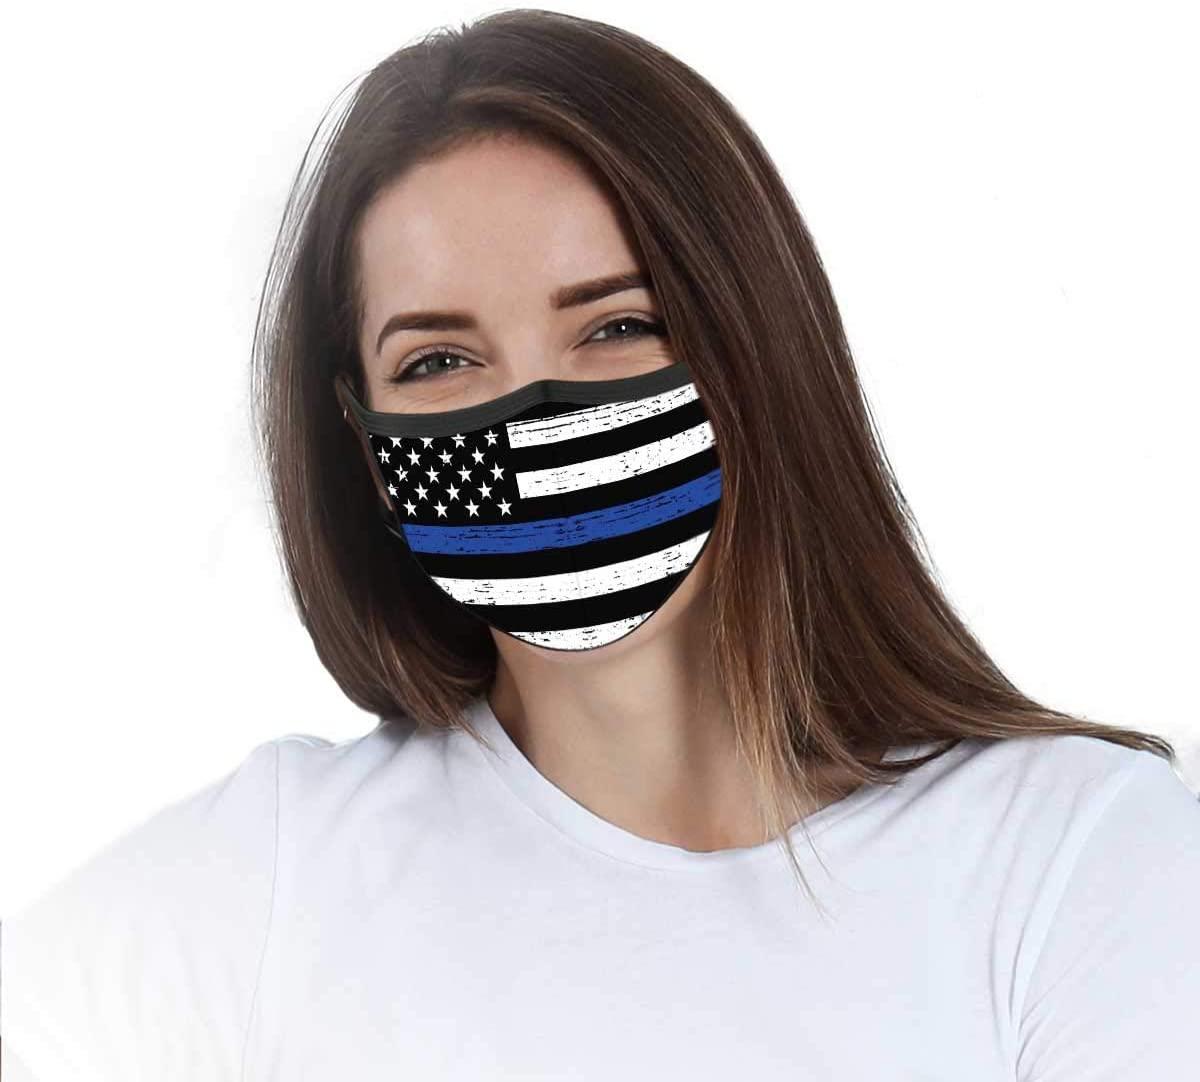 VTH GLOBAL Police Officer Thin Blue Line Lives Matter American Flag Law Enforcement Support Back Deputy Sheriff Design Print Cloth Reusable Washable Face Mask Women Men for Dust Protection